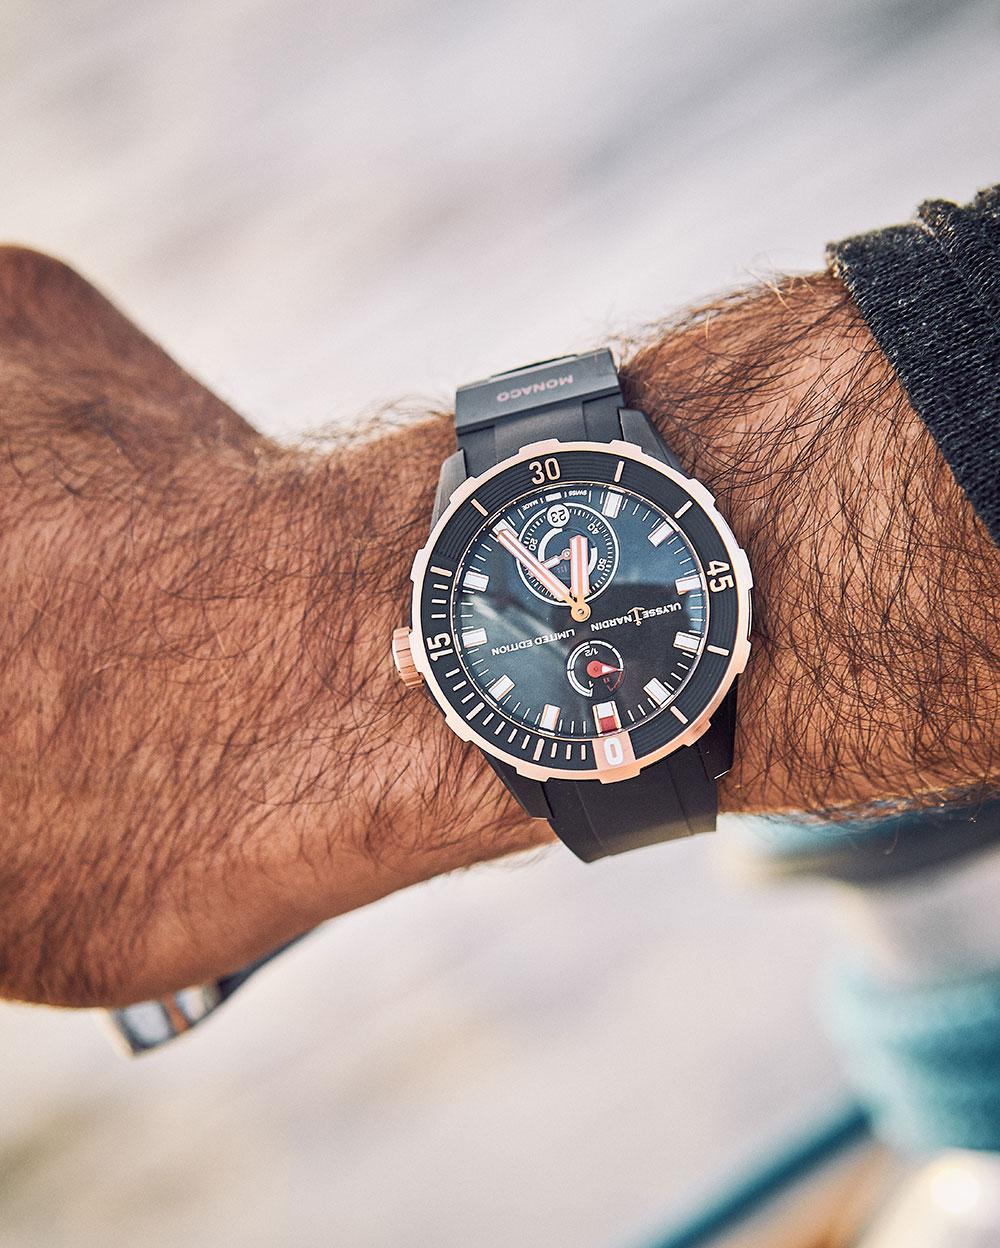 Reloj de buceo Ulysse Nardin Diver Chronometer